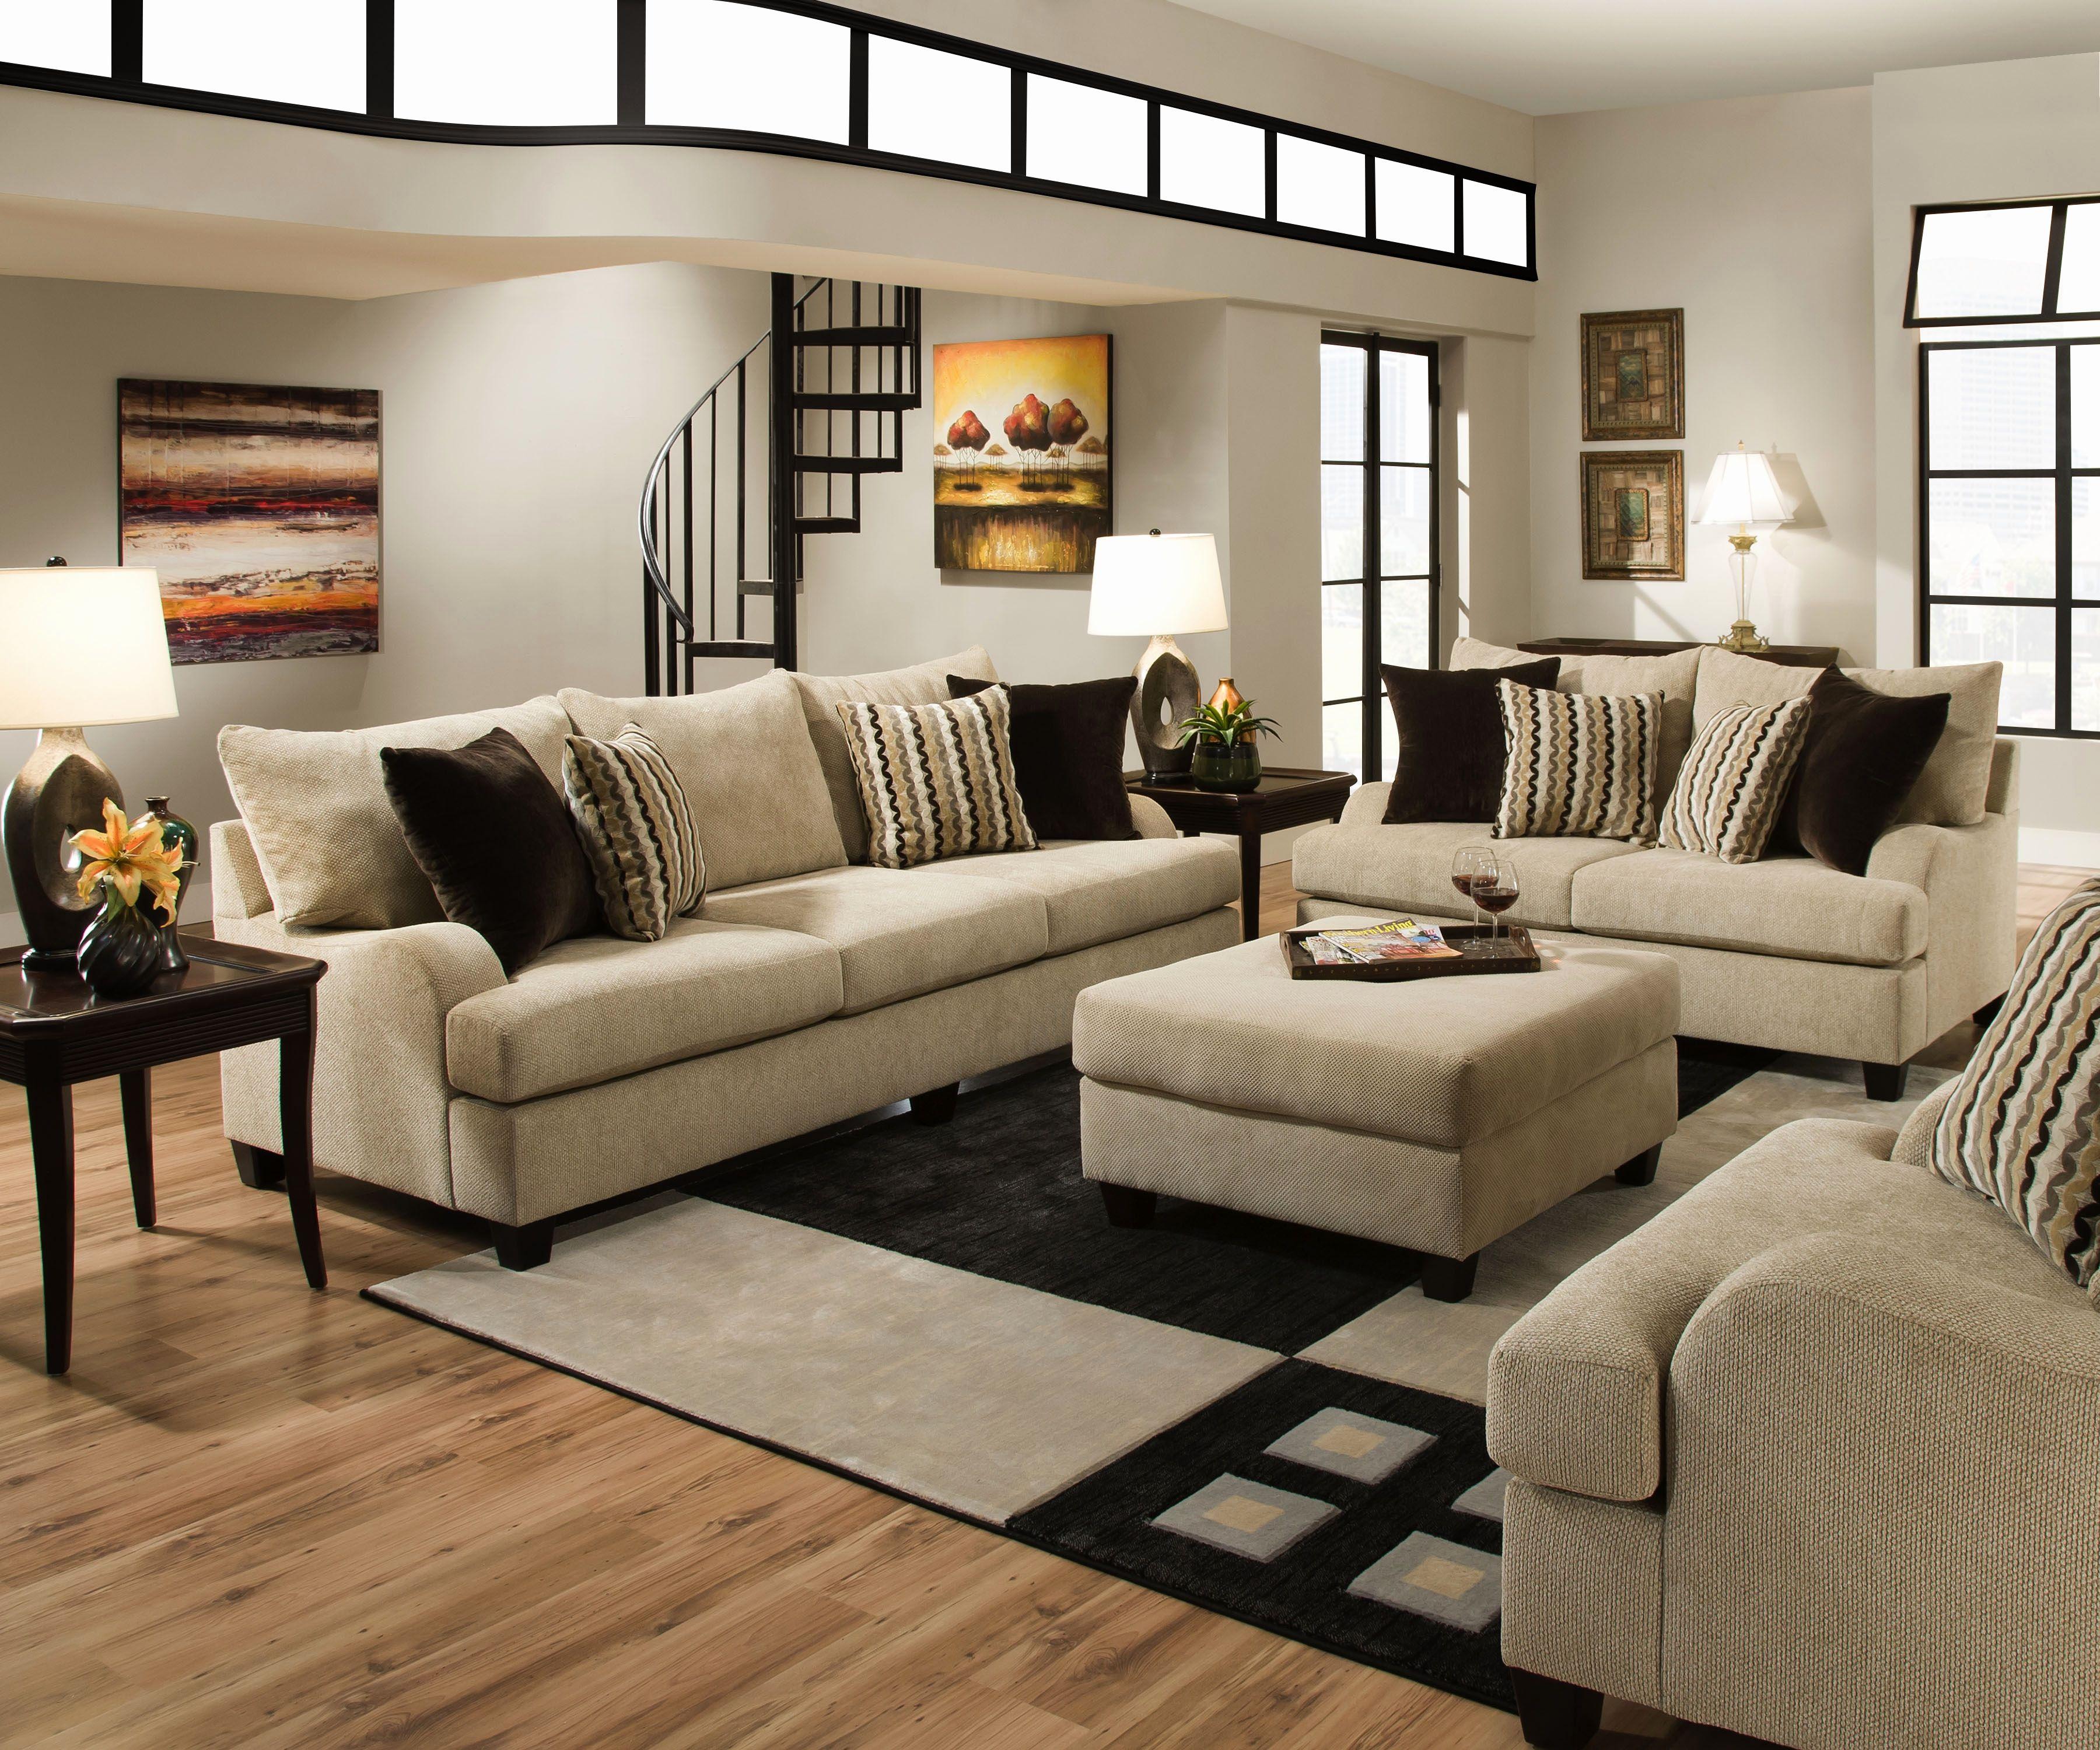 Luxury Sofa Set Designs For Living Room Picture Sofa Set